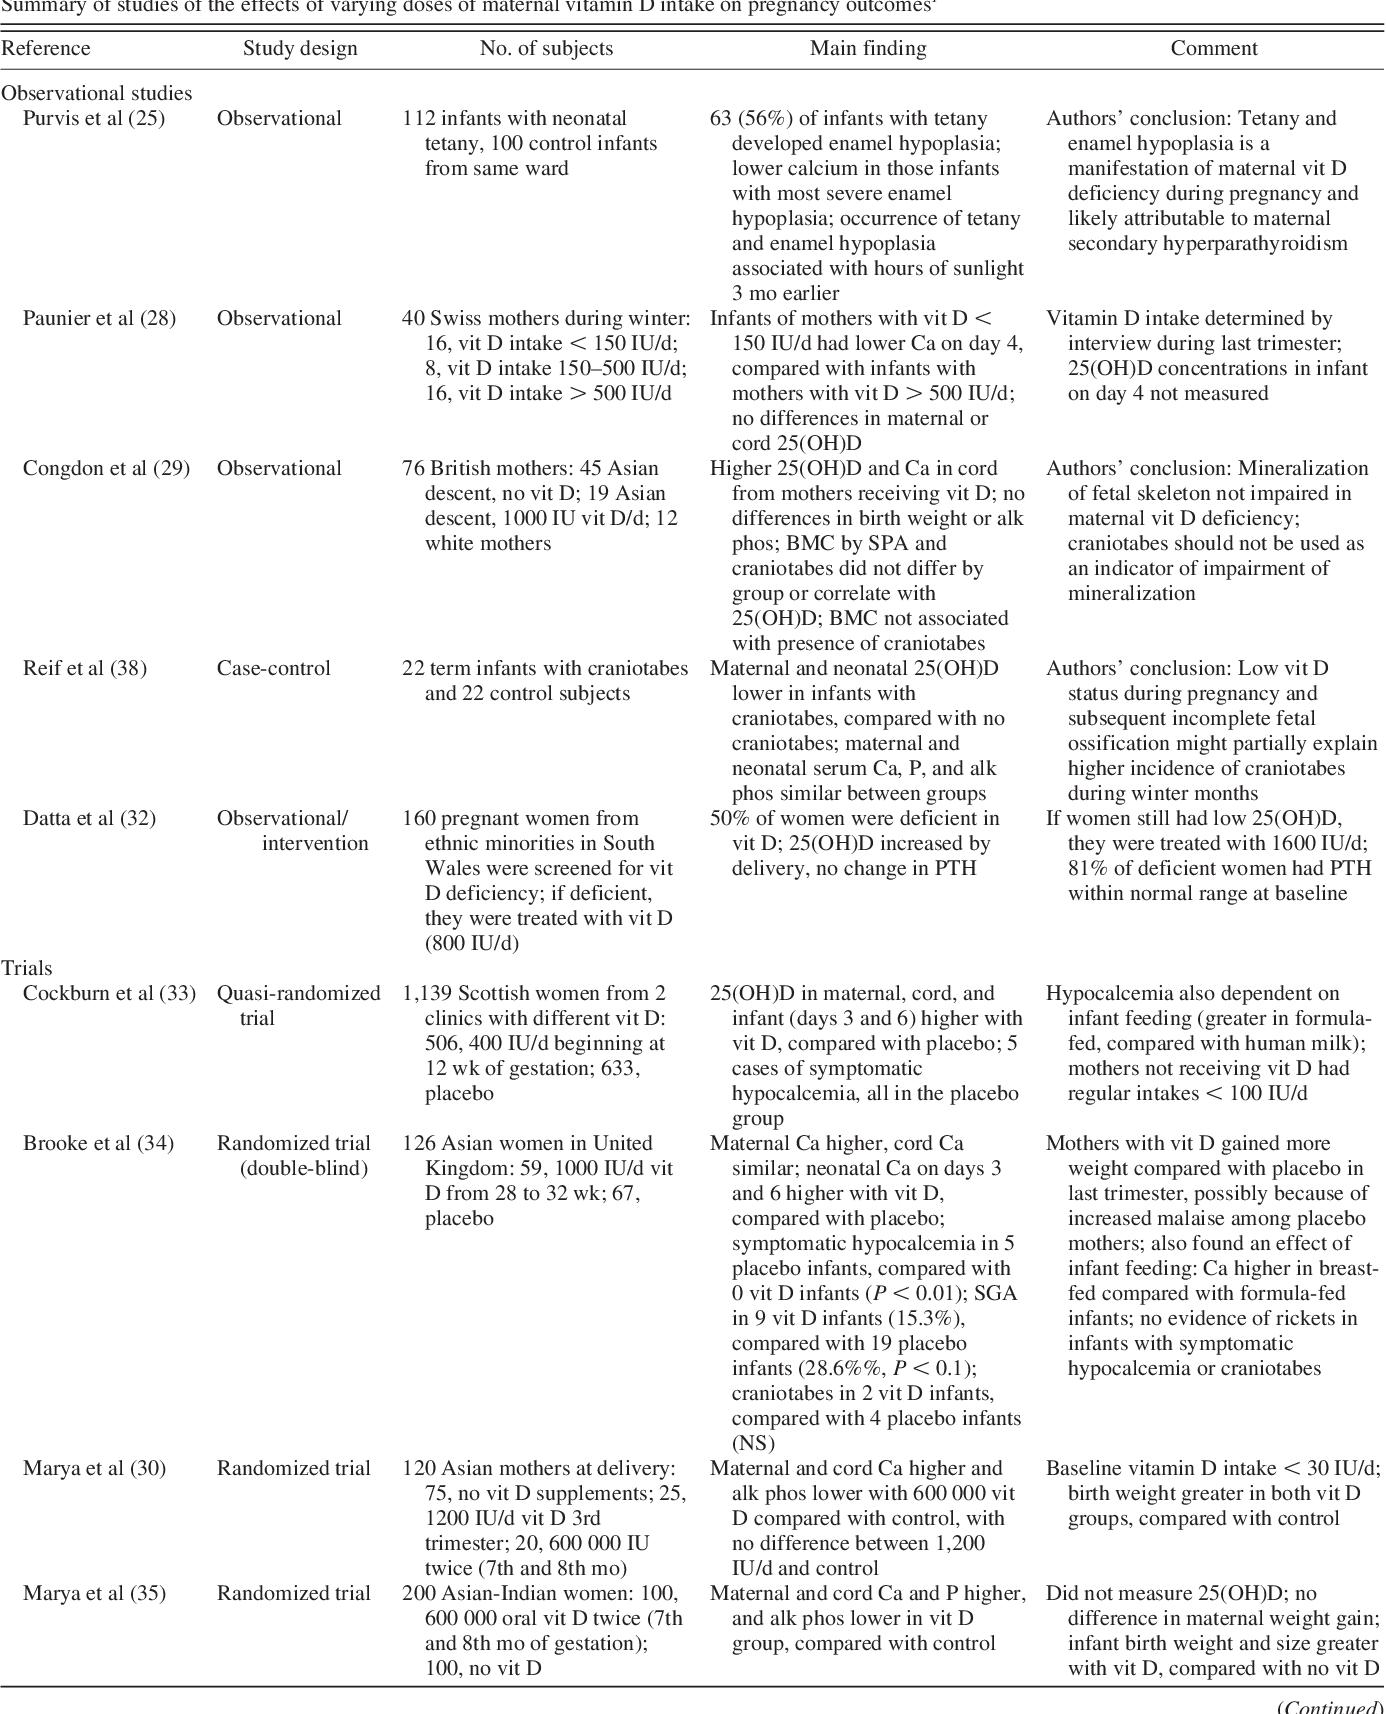 Vitamin D Deficiency During Pregnancy >> Pdf Vitamin D Requirements During Pregnancy 1 4 Semantic